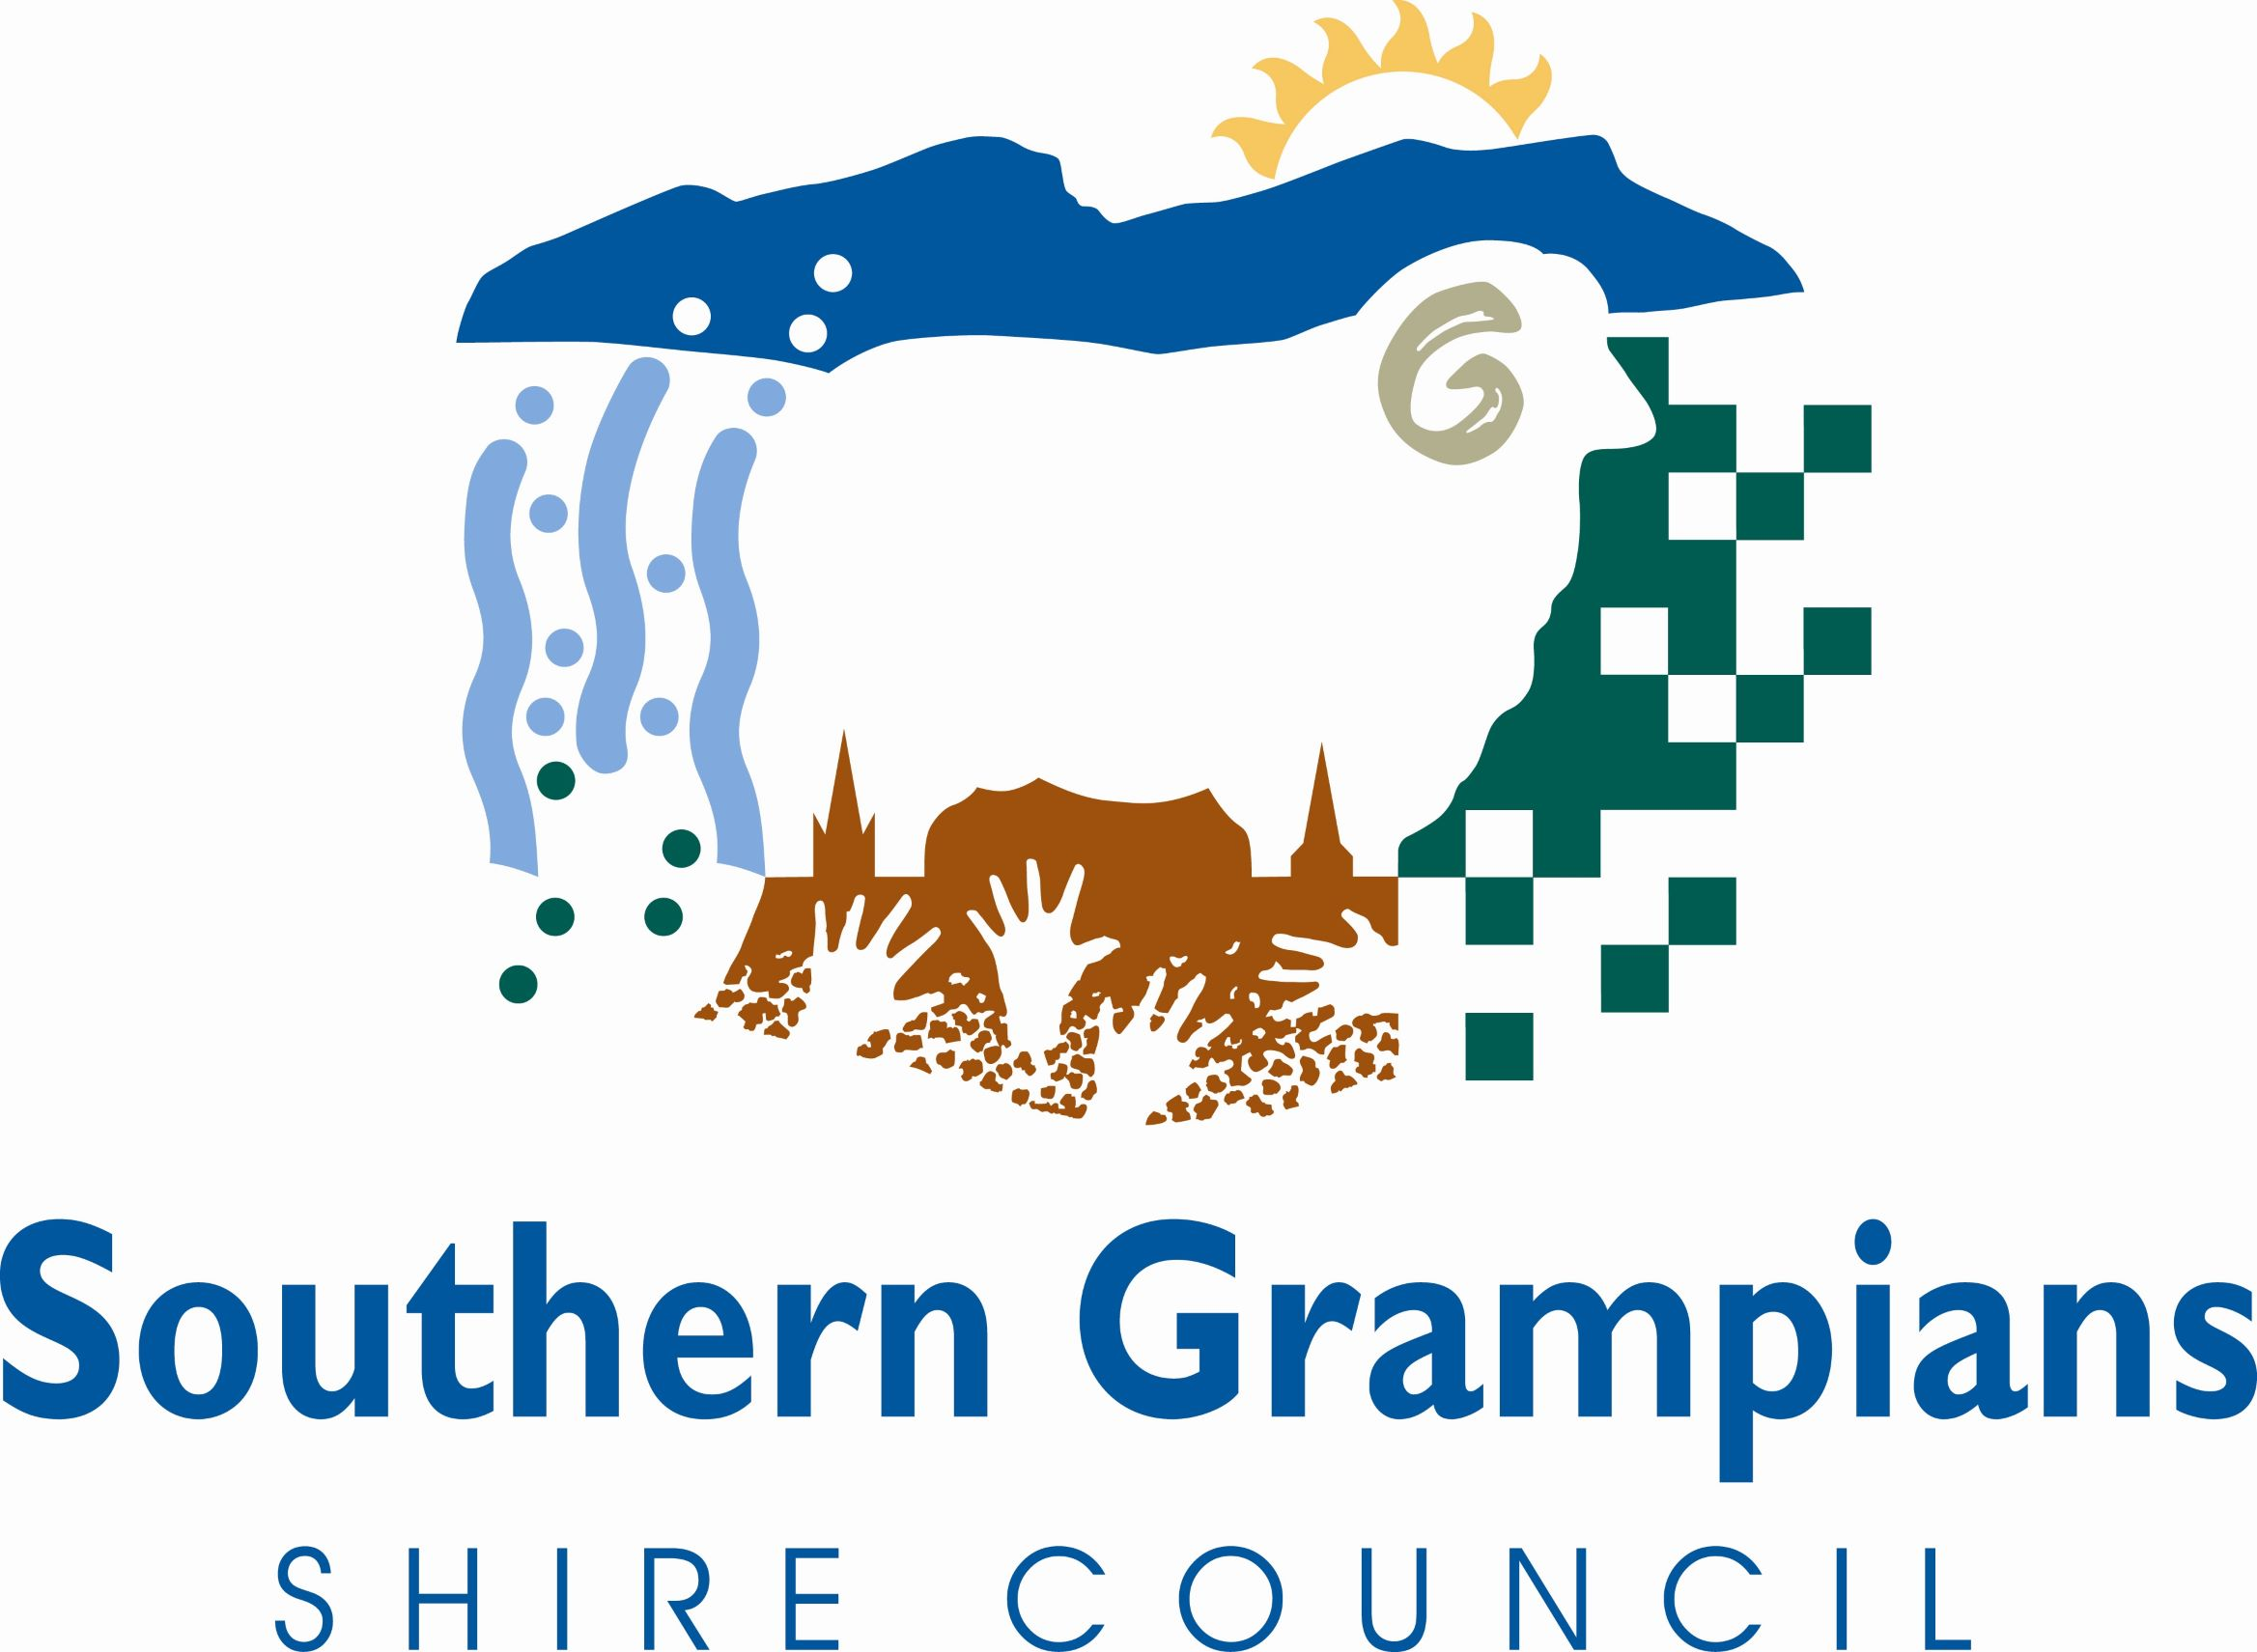 Southern Grampians Shire Council